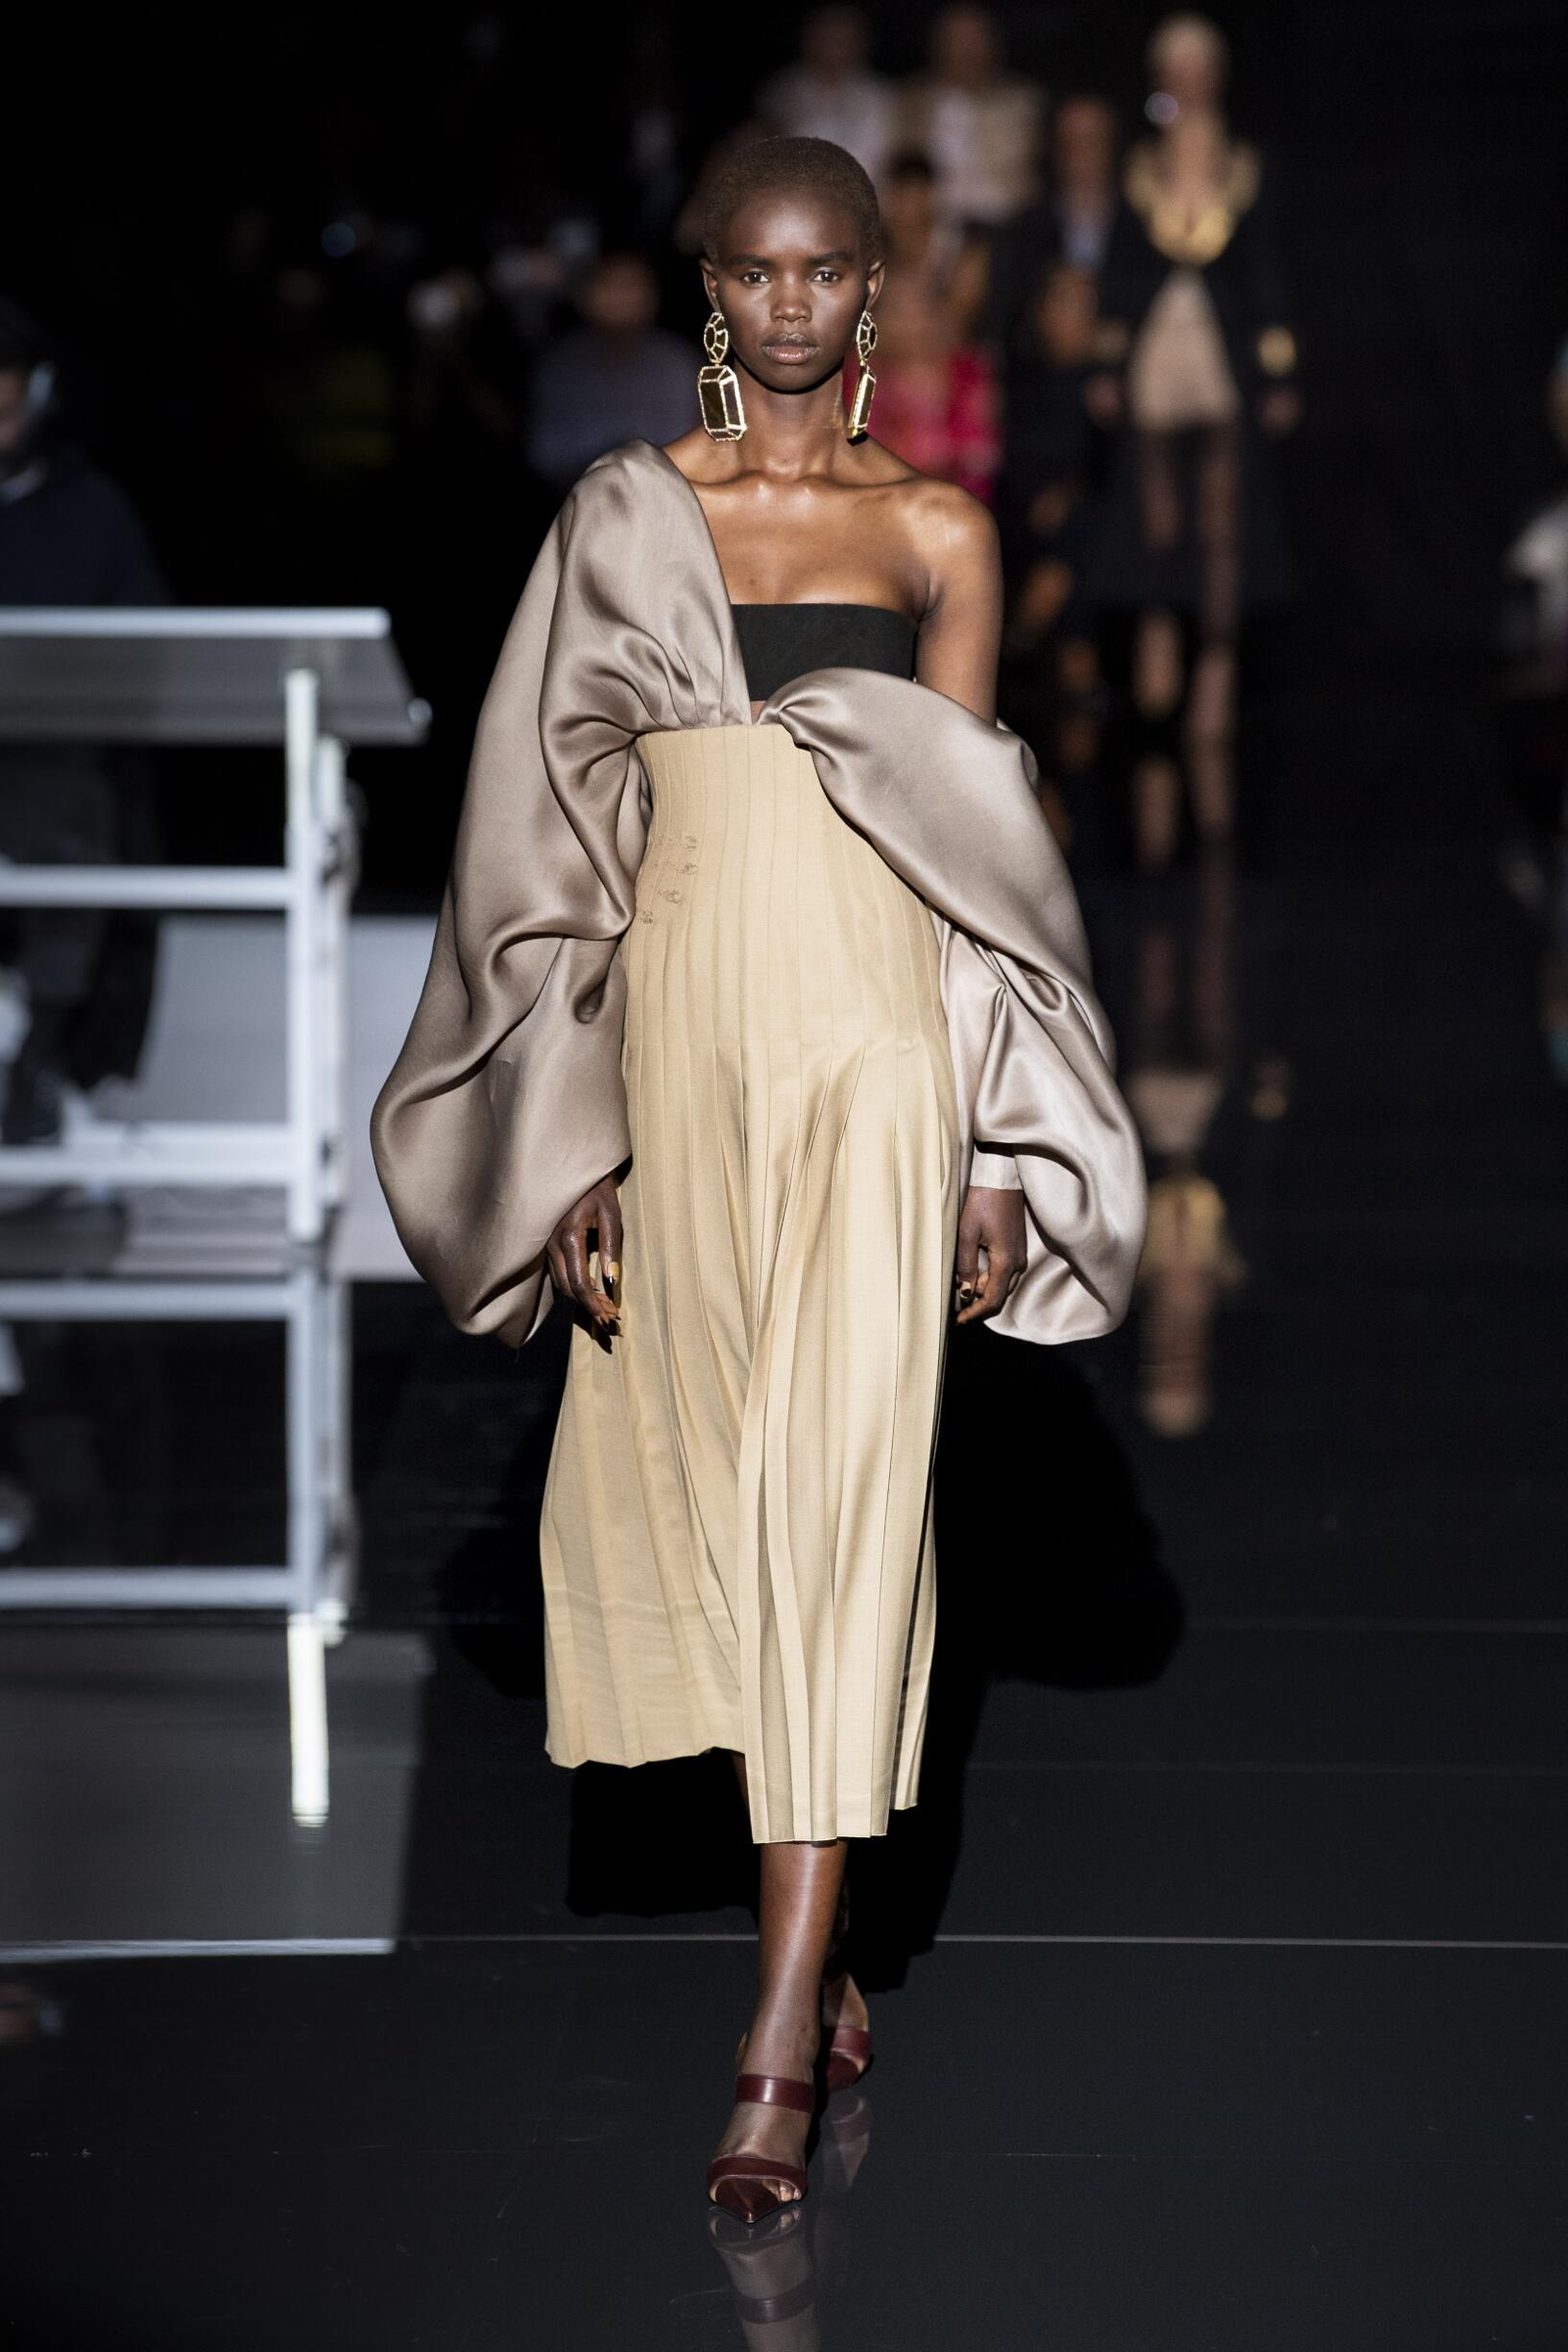 FW 2019-20 Schiaparelli Haute Couture Fashion Show